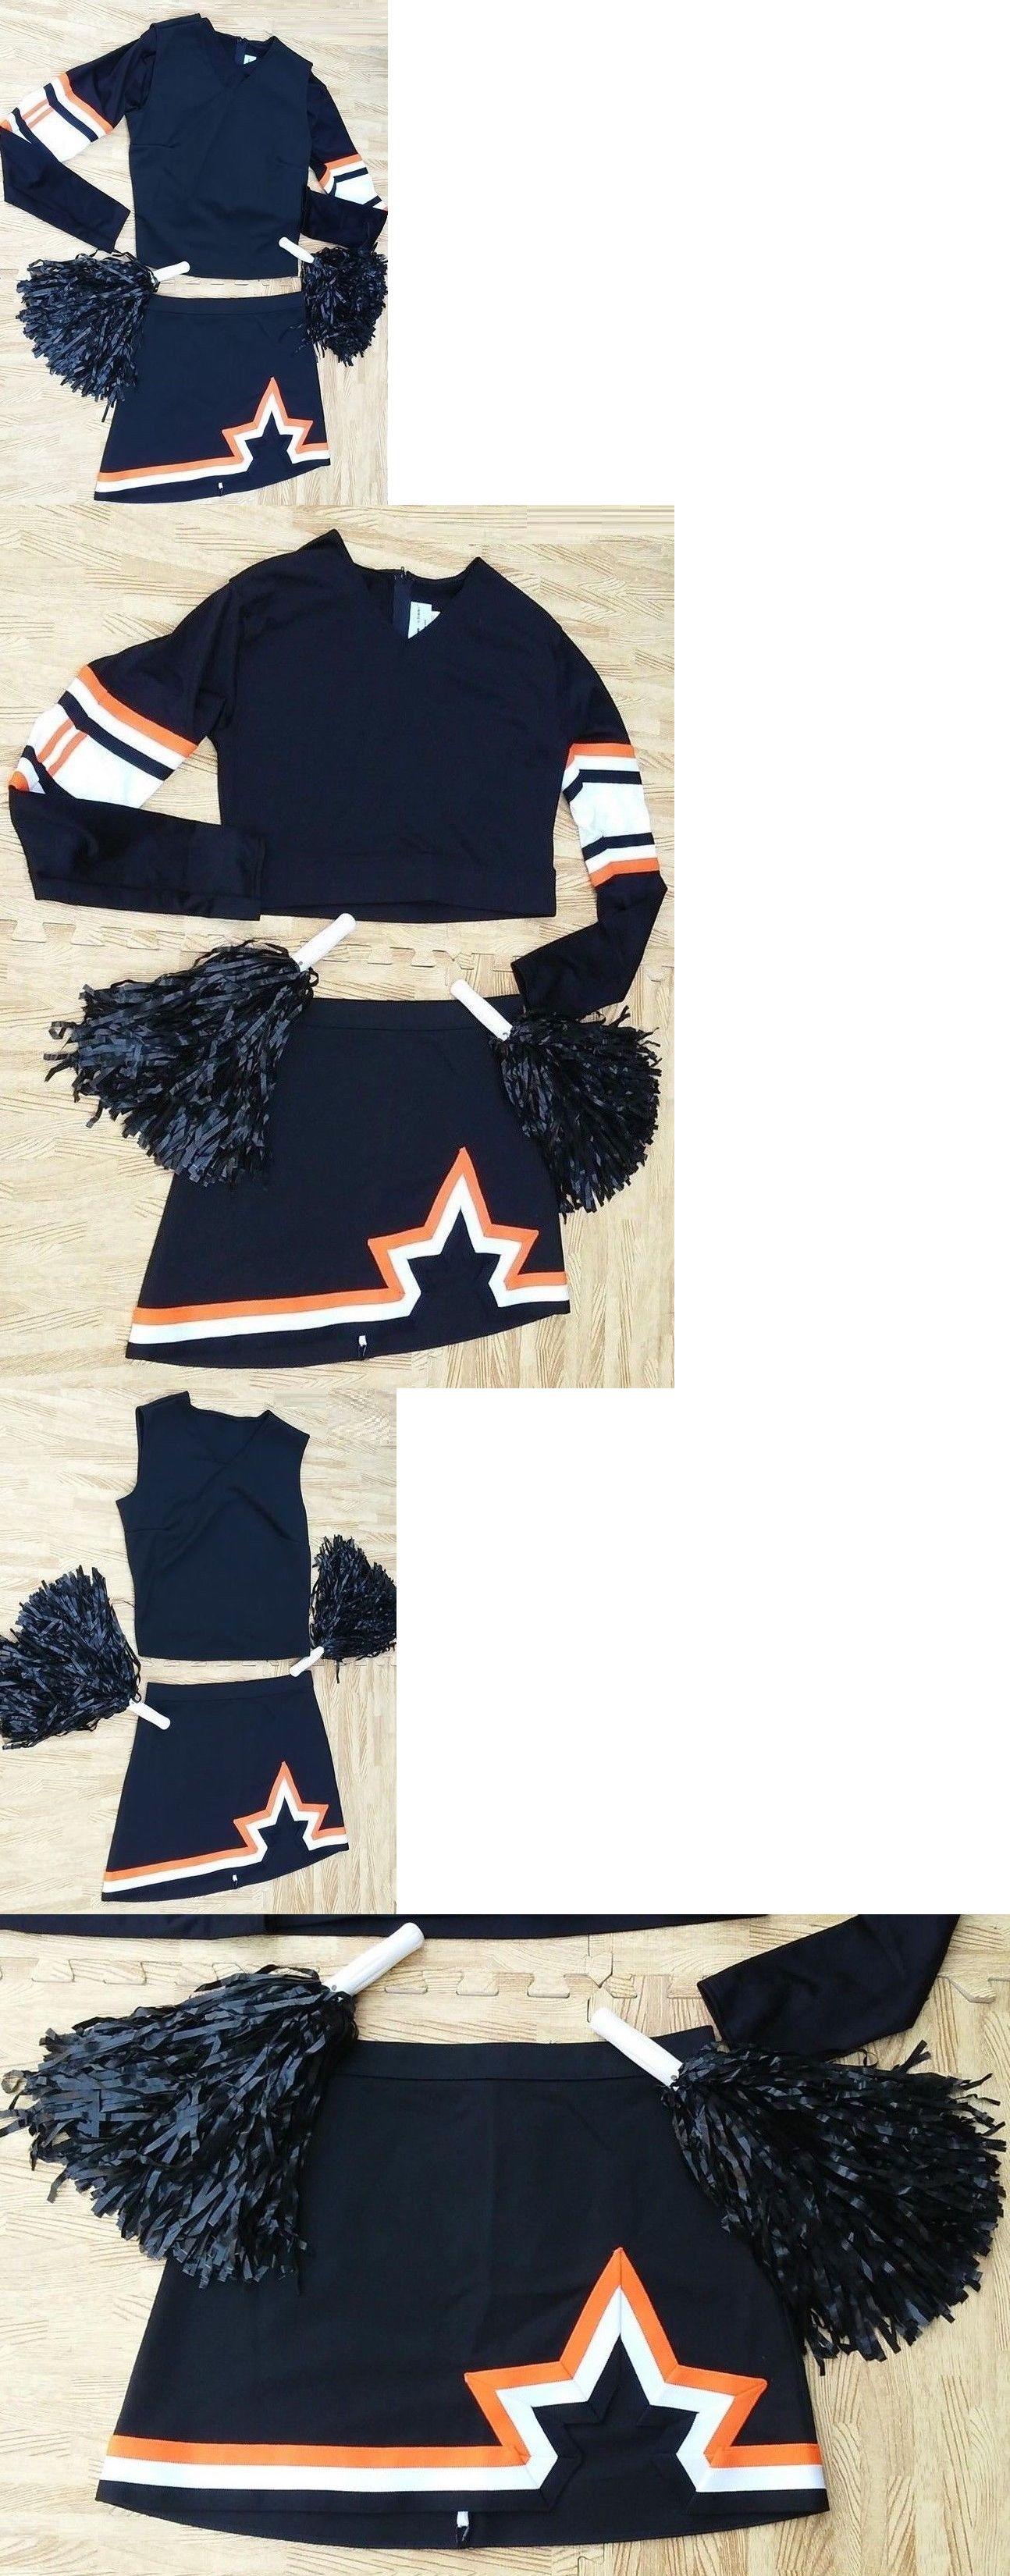 a444cfe261a Cheerleading 66832  Adult Real Black Orange Complete Cheerleader Uniform Xl  Top L Skirt 40-